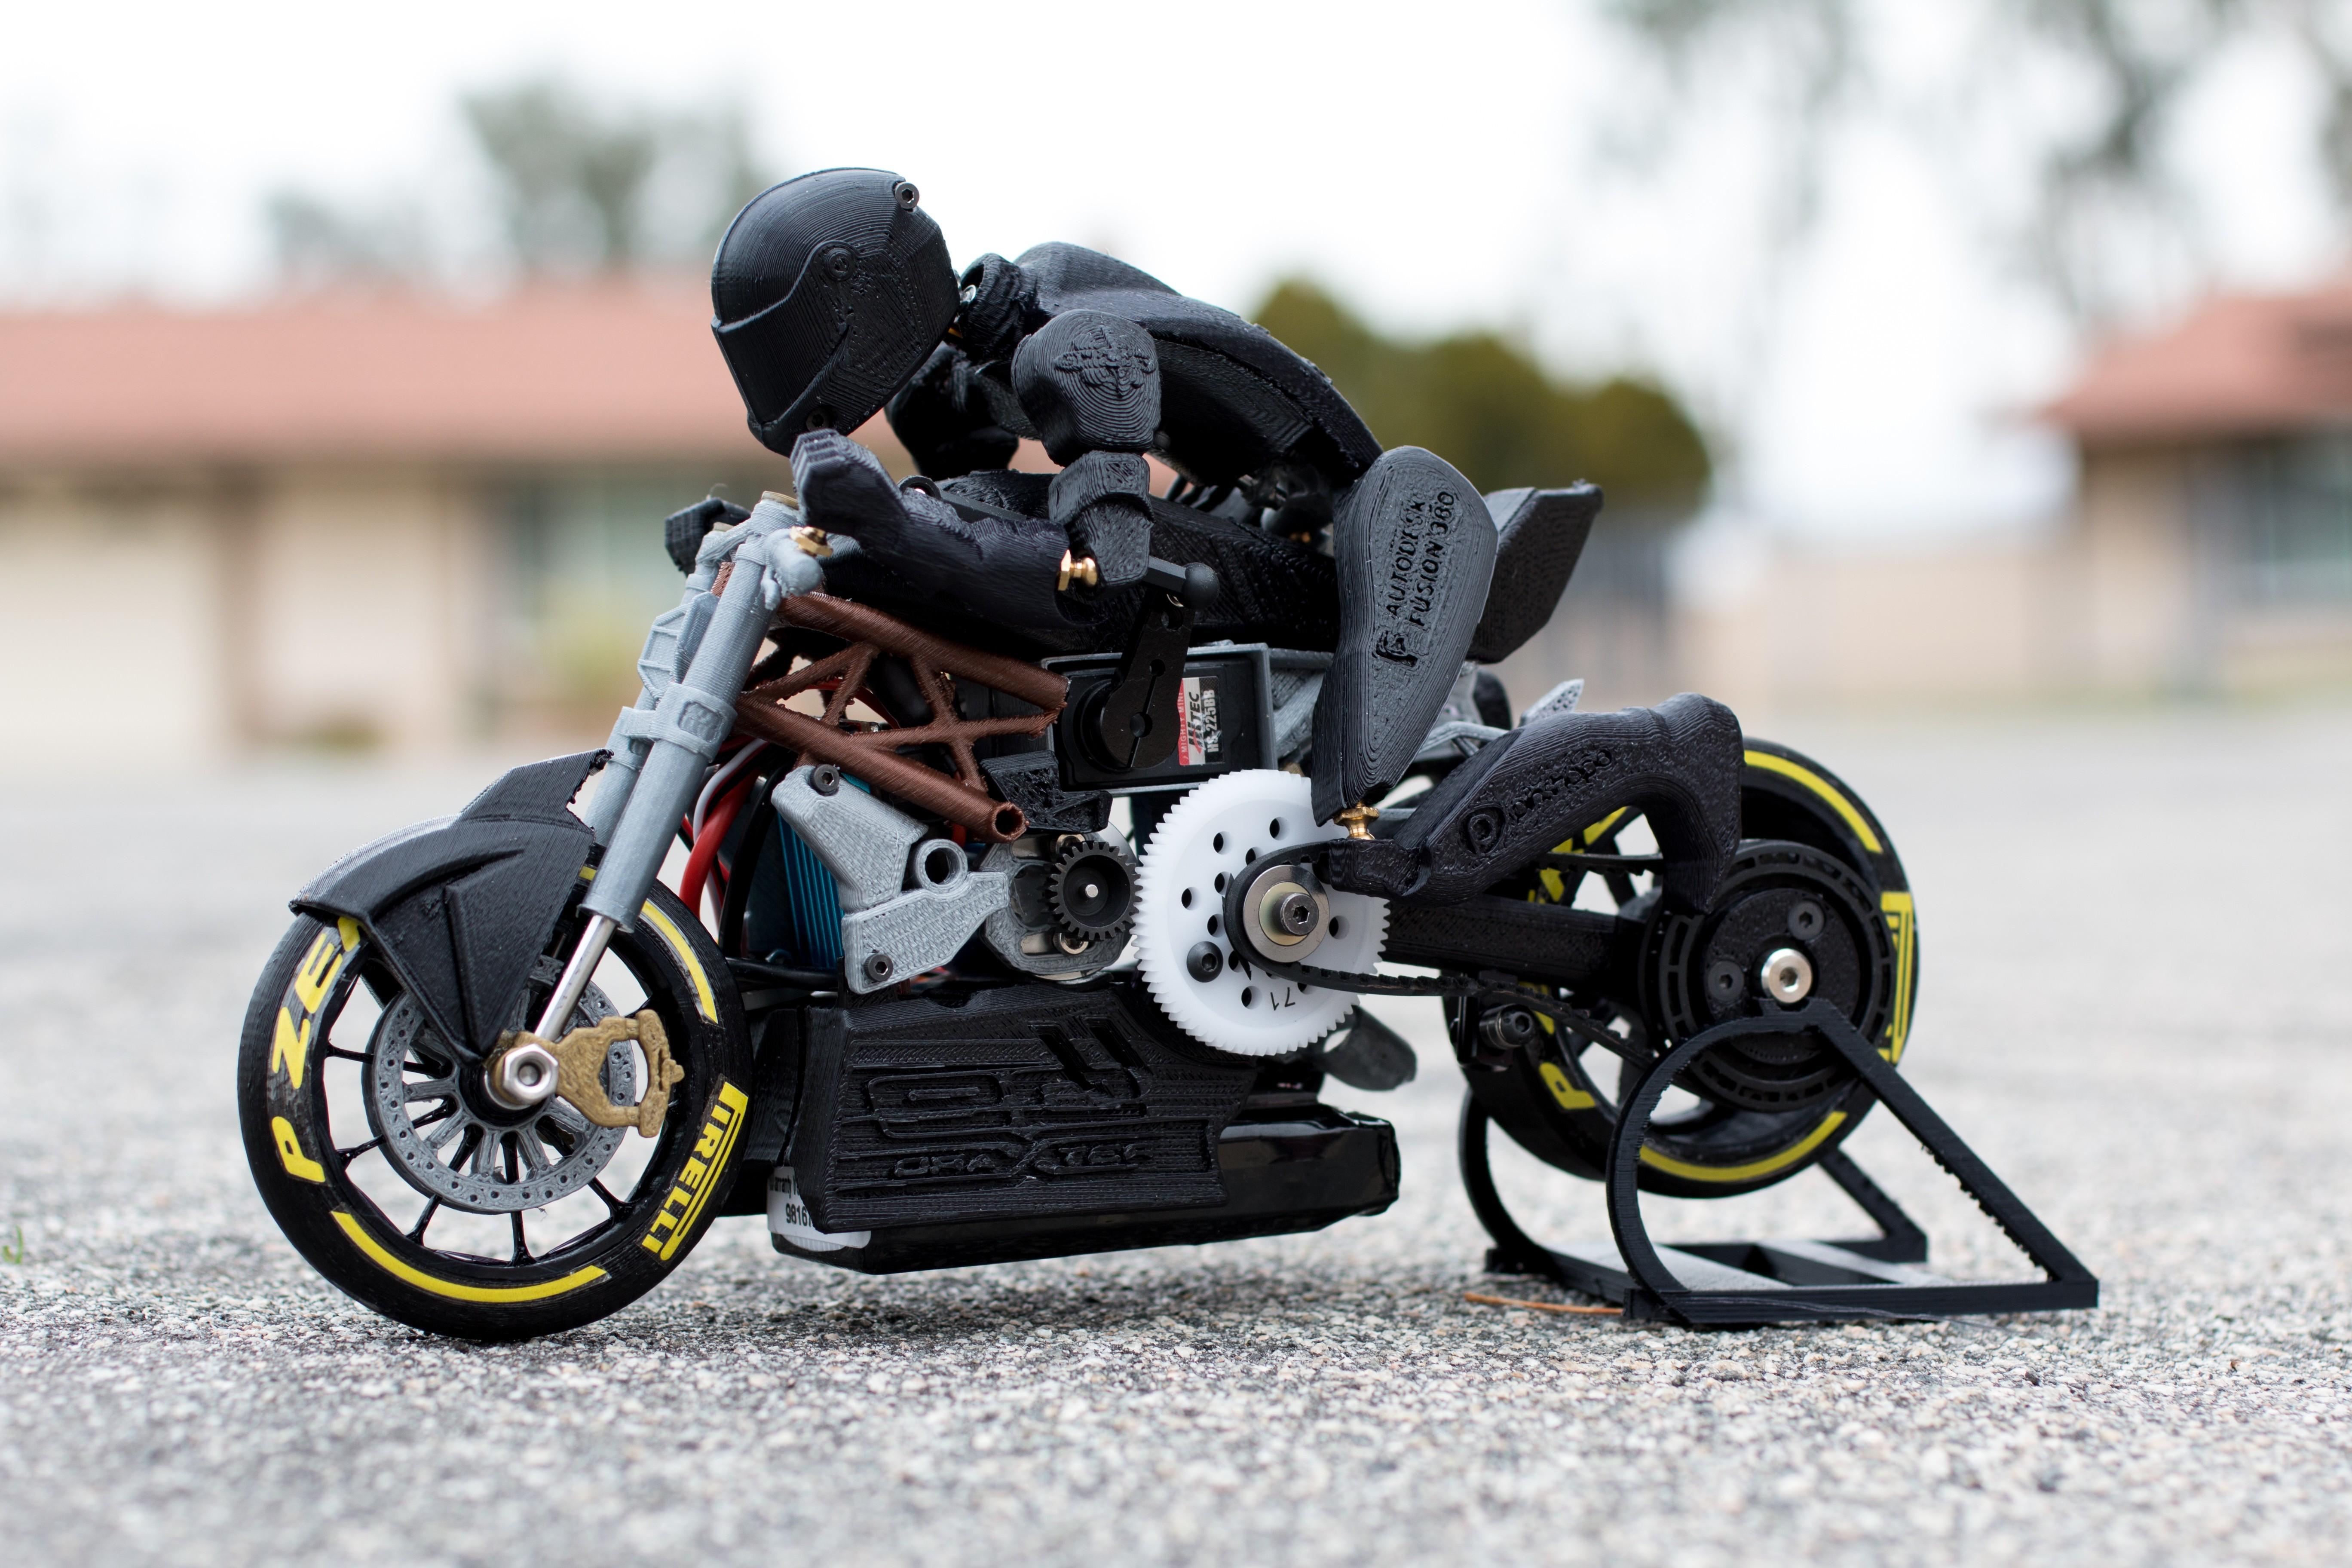 _MG_4488.jpg Download free STL file 2016 Ducati Draxter Concept Drag Bike RC • 3D printer template, brett